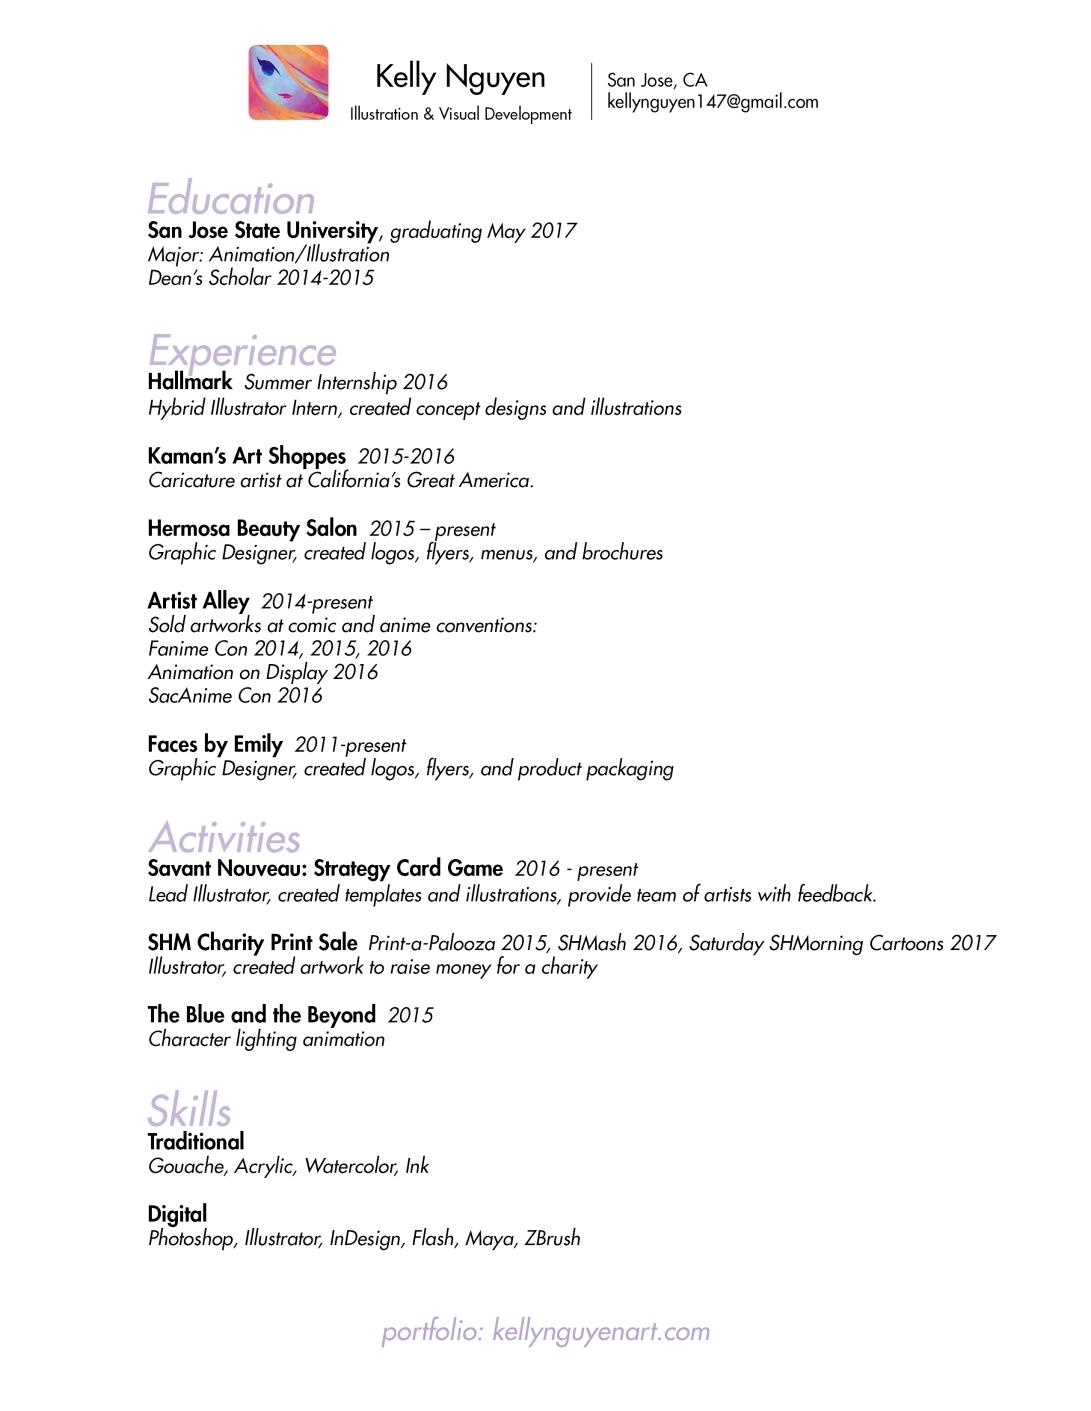 Nguyen_Kelly_Resume_Spring2017_forweb.jpg